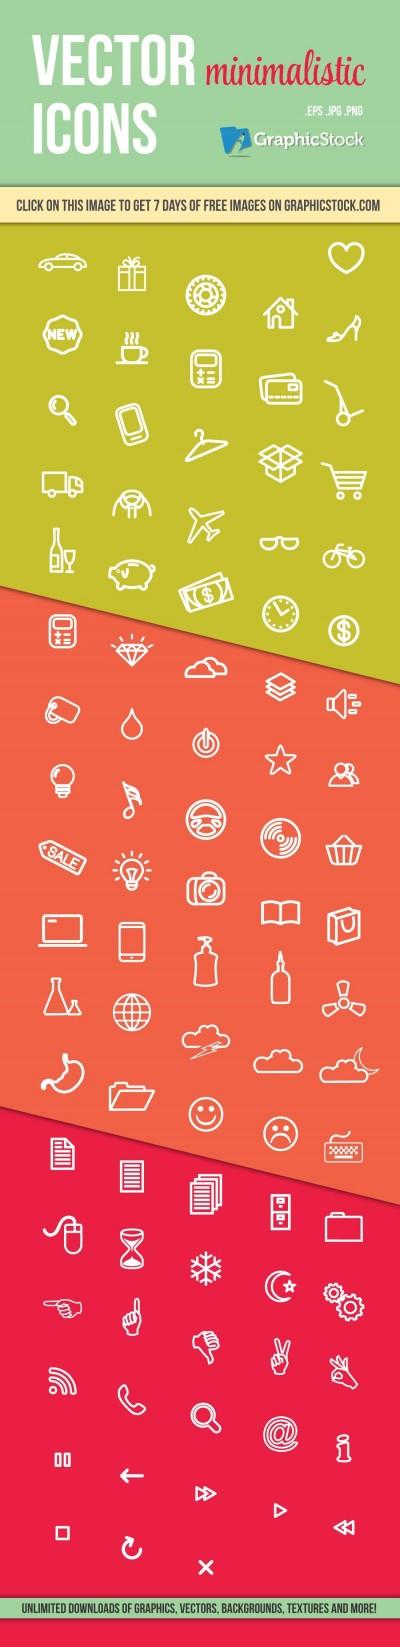 minimalist icons-min